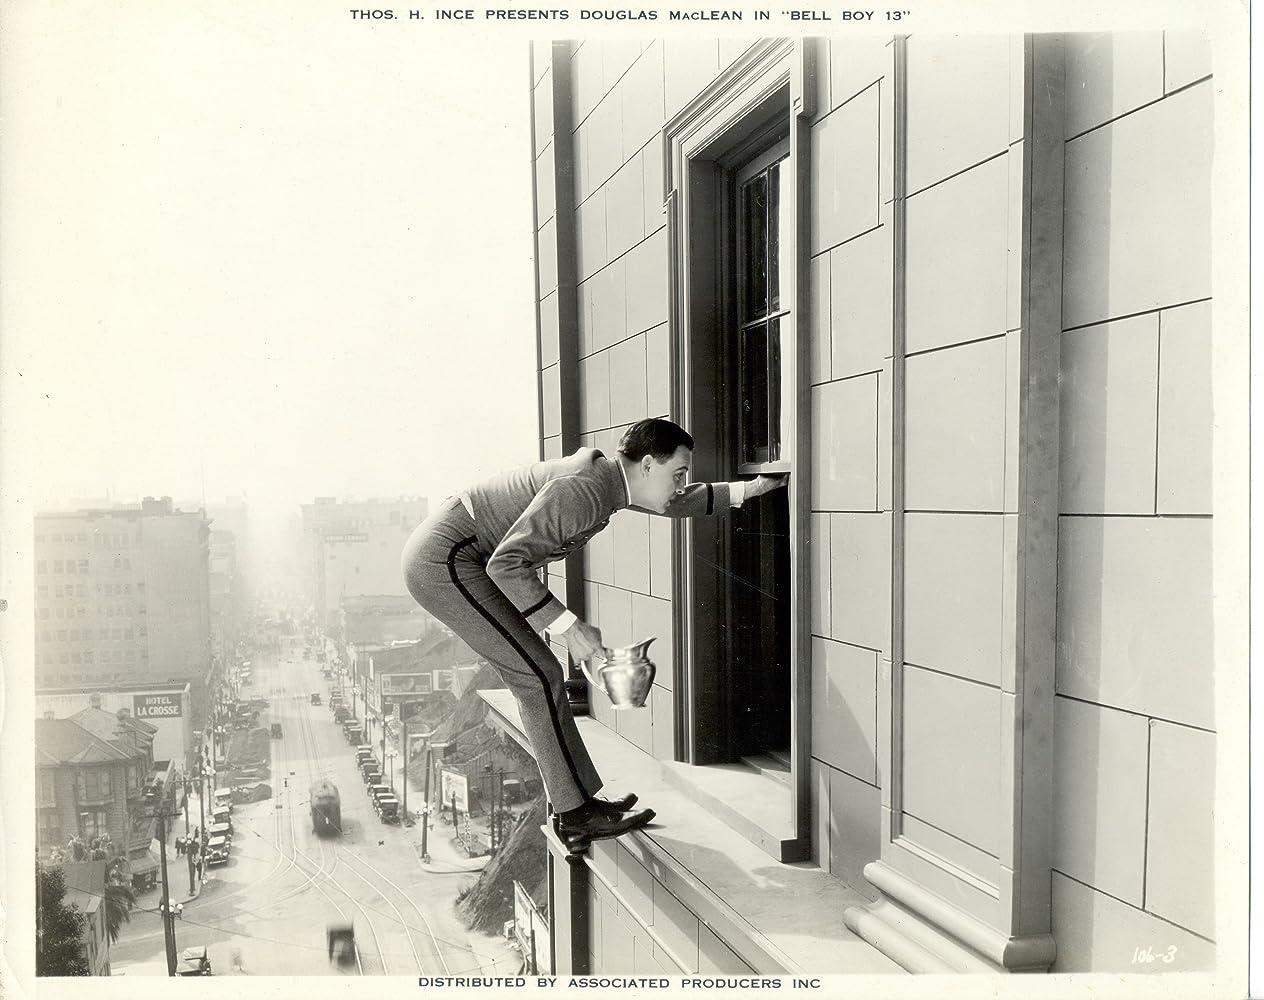 Douglas MacLean in Bell Boy 13 (1923)